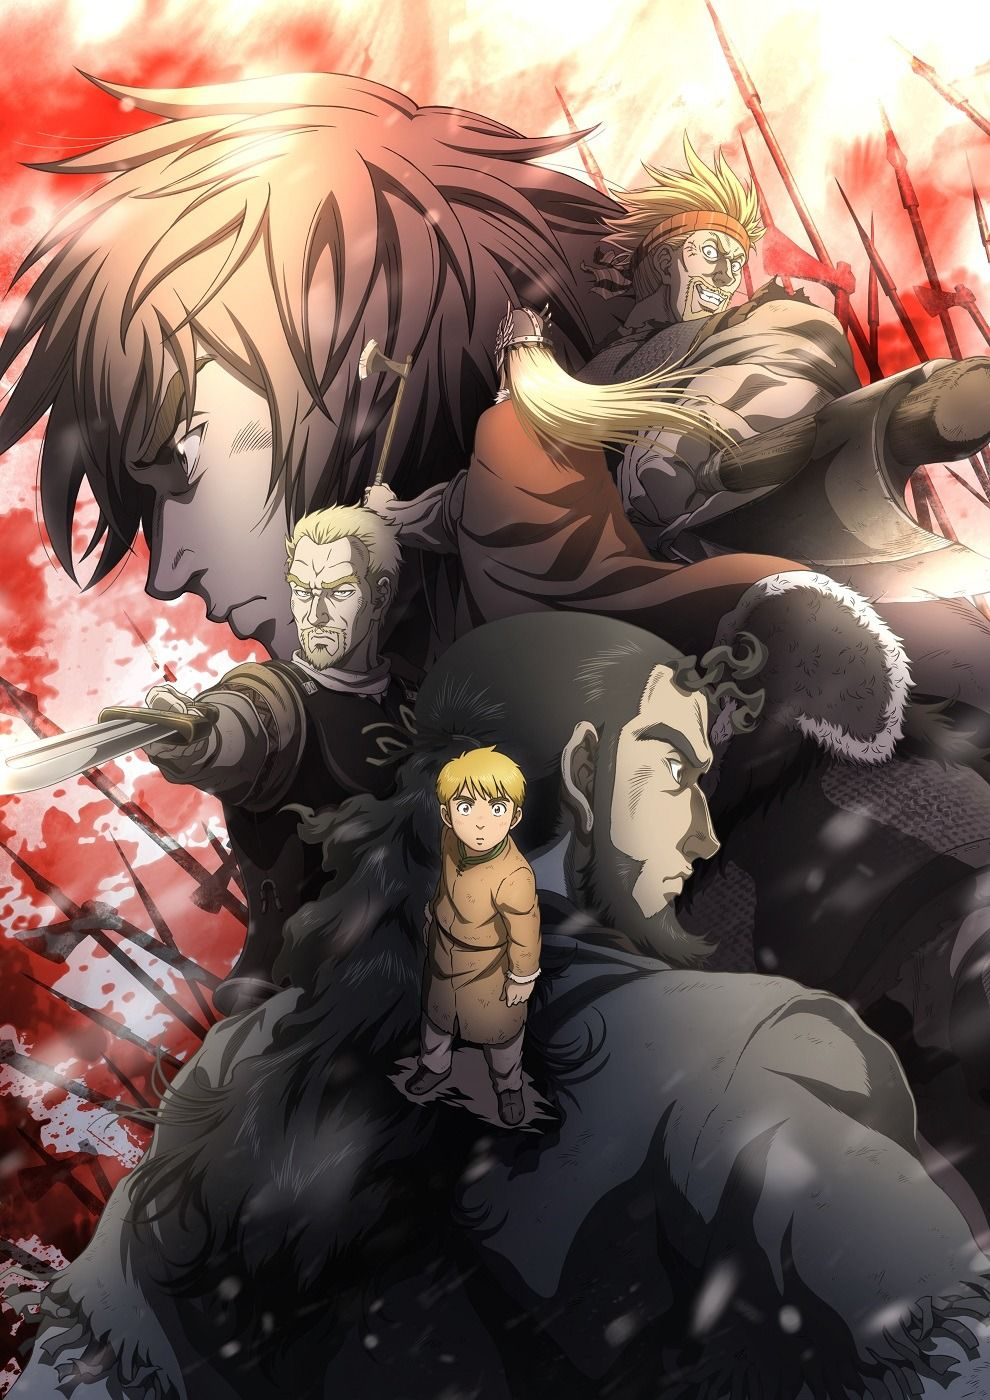 Vinland in 2020 Vinland saga, Anime, Vinland saga manga